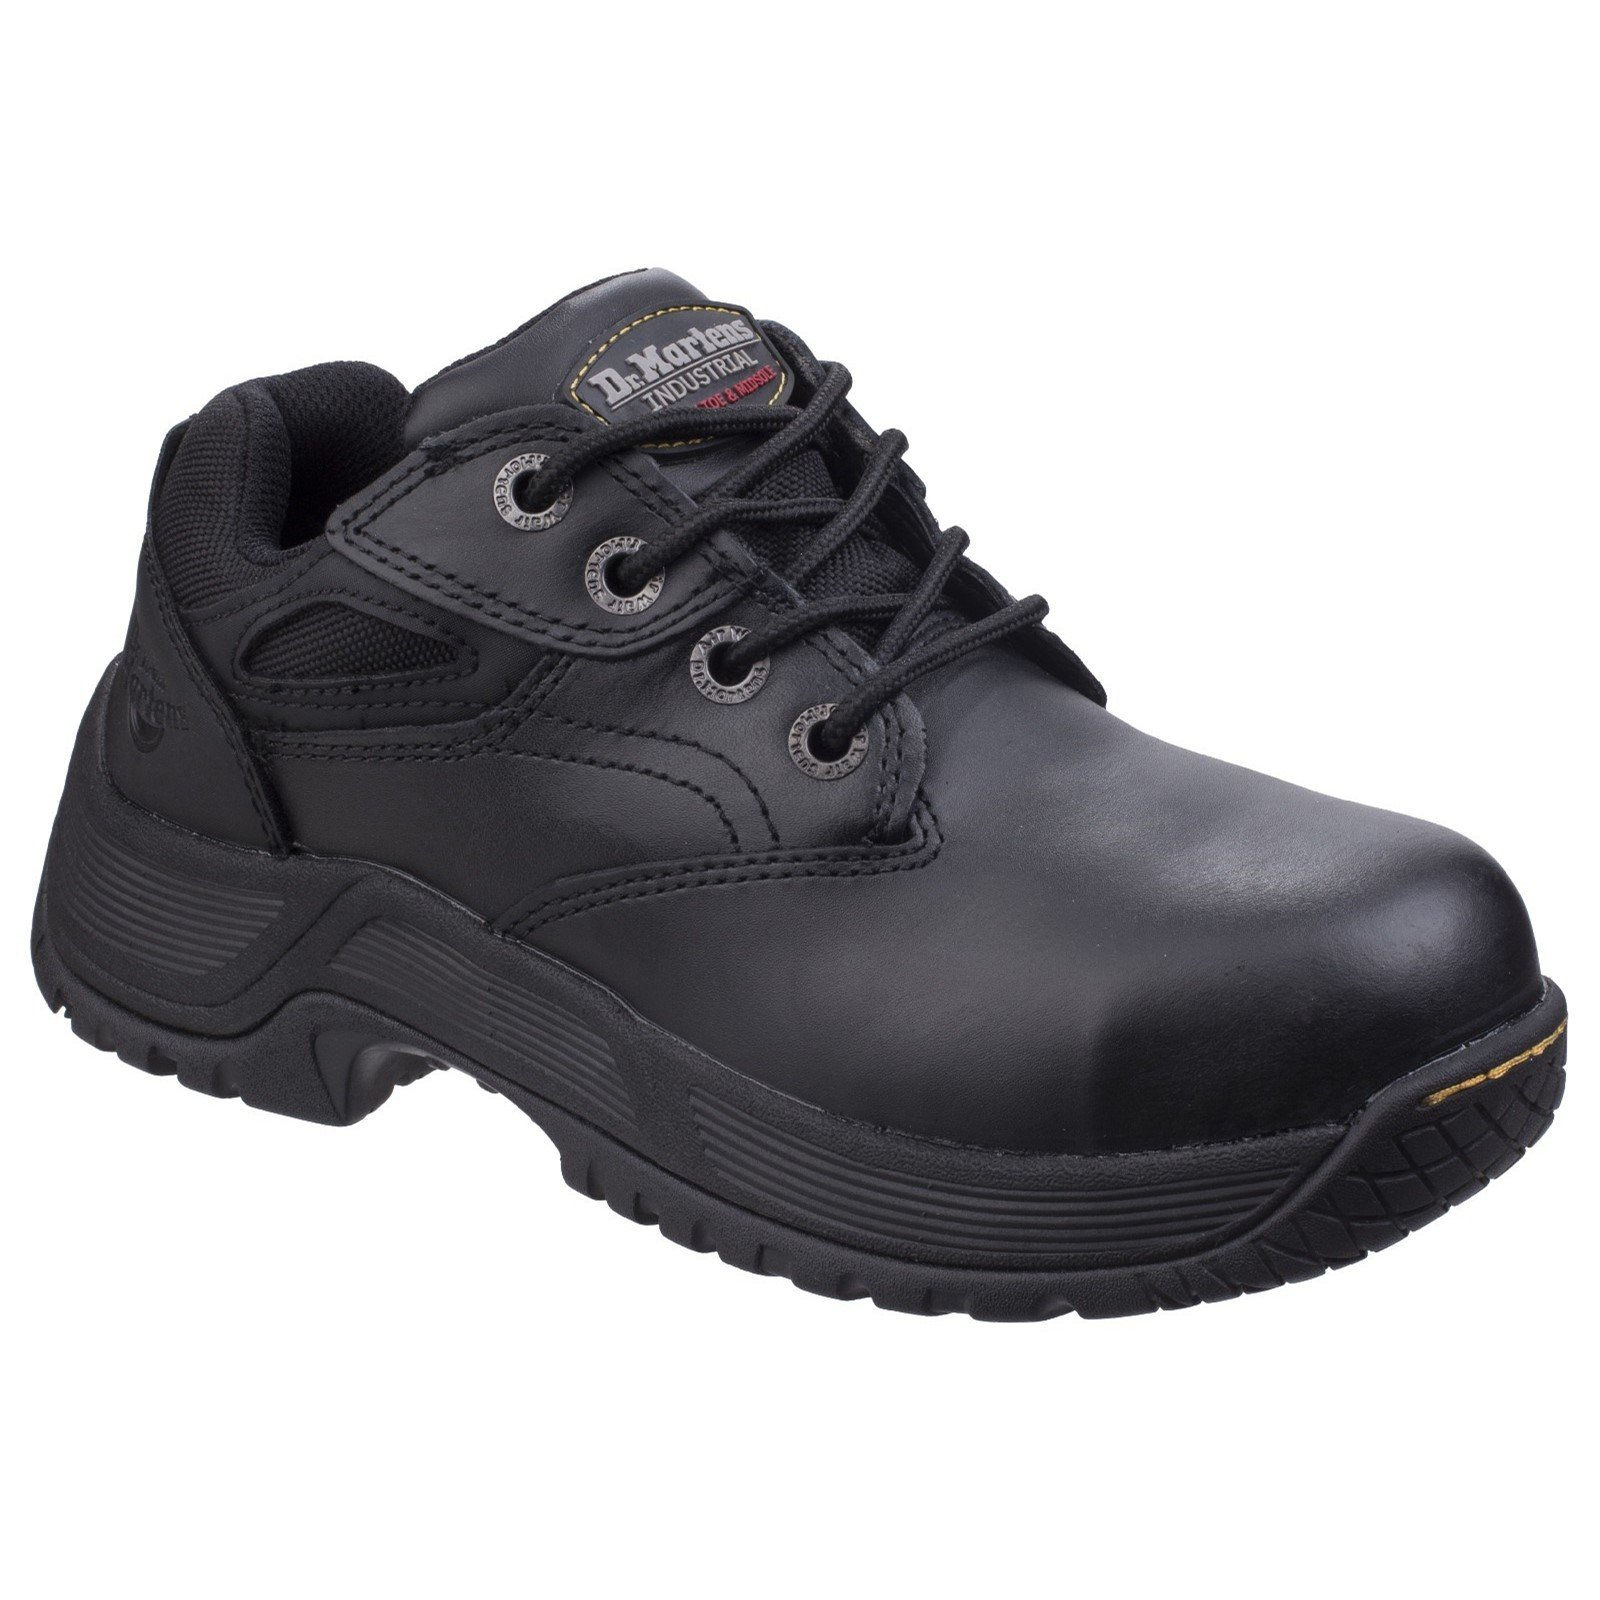 Dr Martens Unisex Calvert Steel Toe Safety Trainer Black 26022 - Black 7